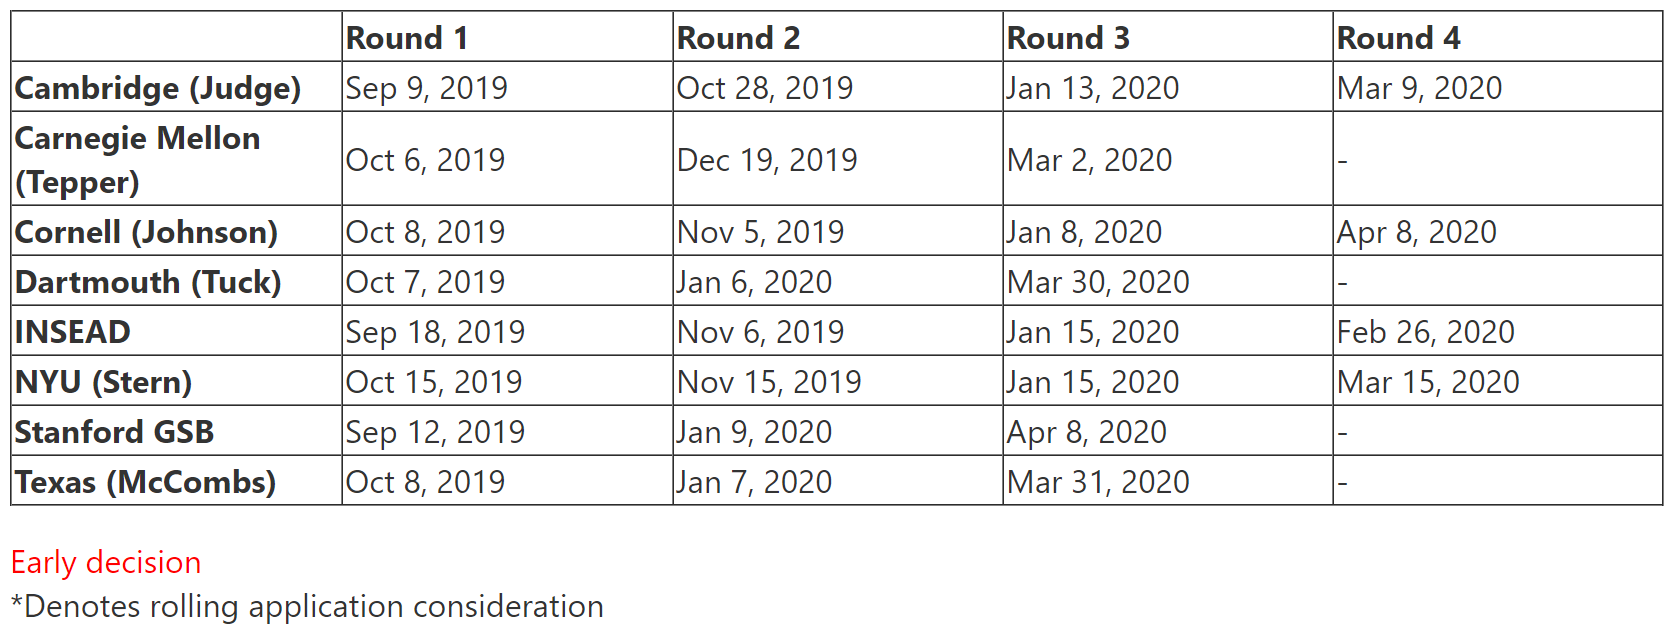 2019–2020 Application Deadlines Roundup